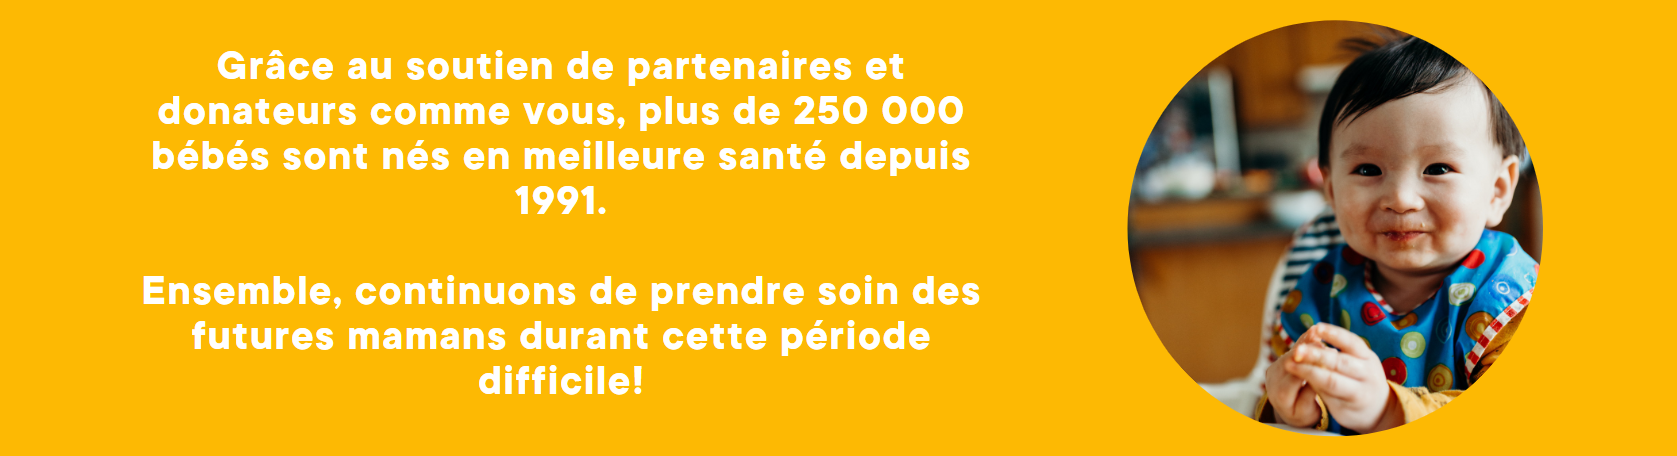 Fondation Olo   Campagne de financement d'urgence COVID-19